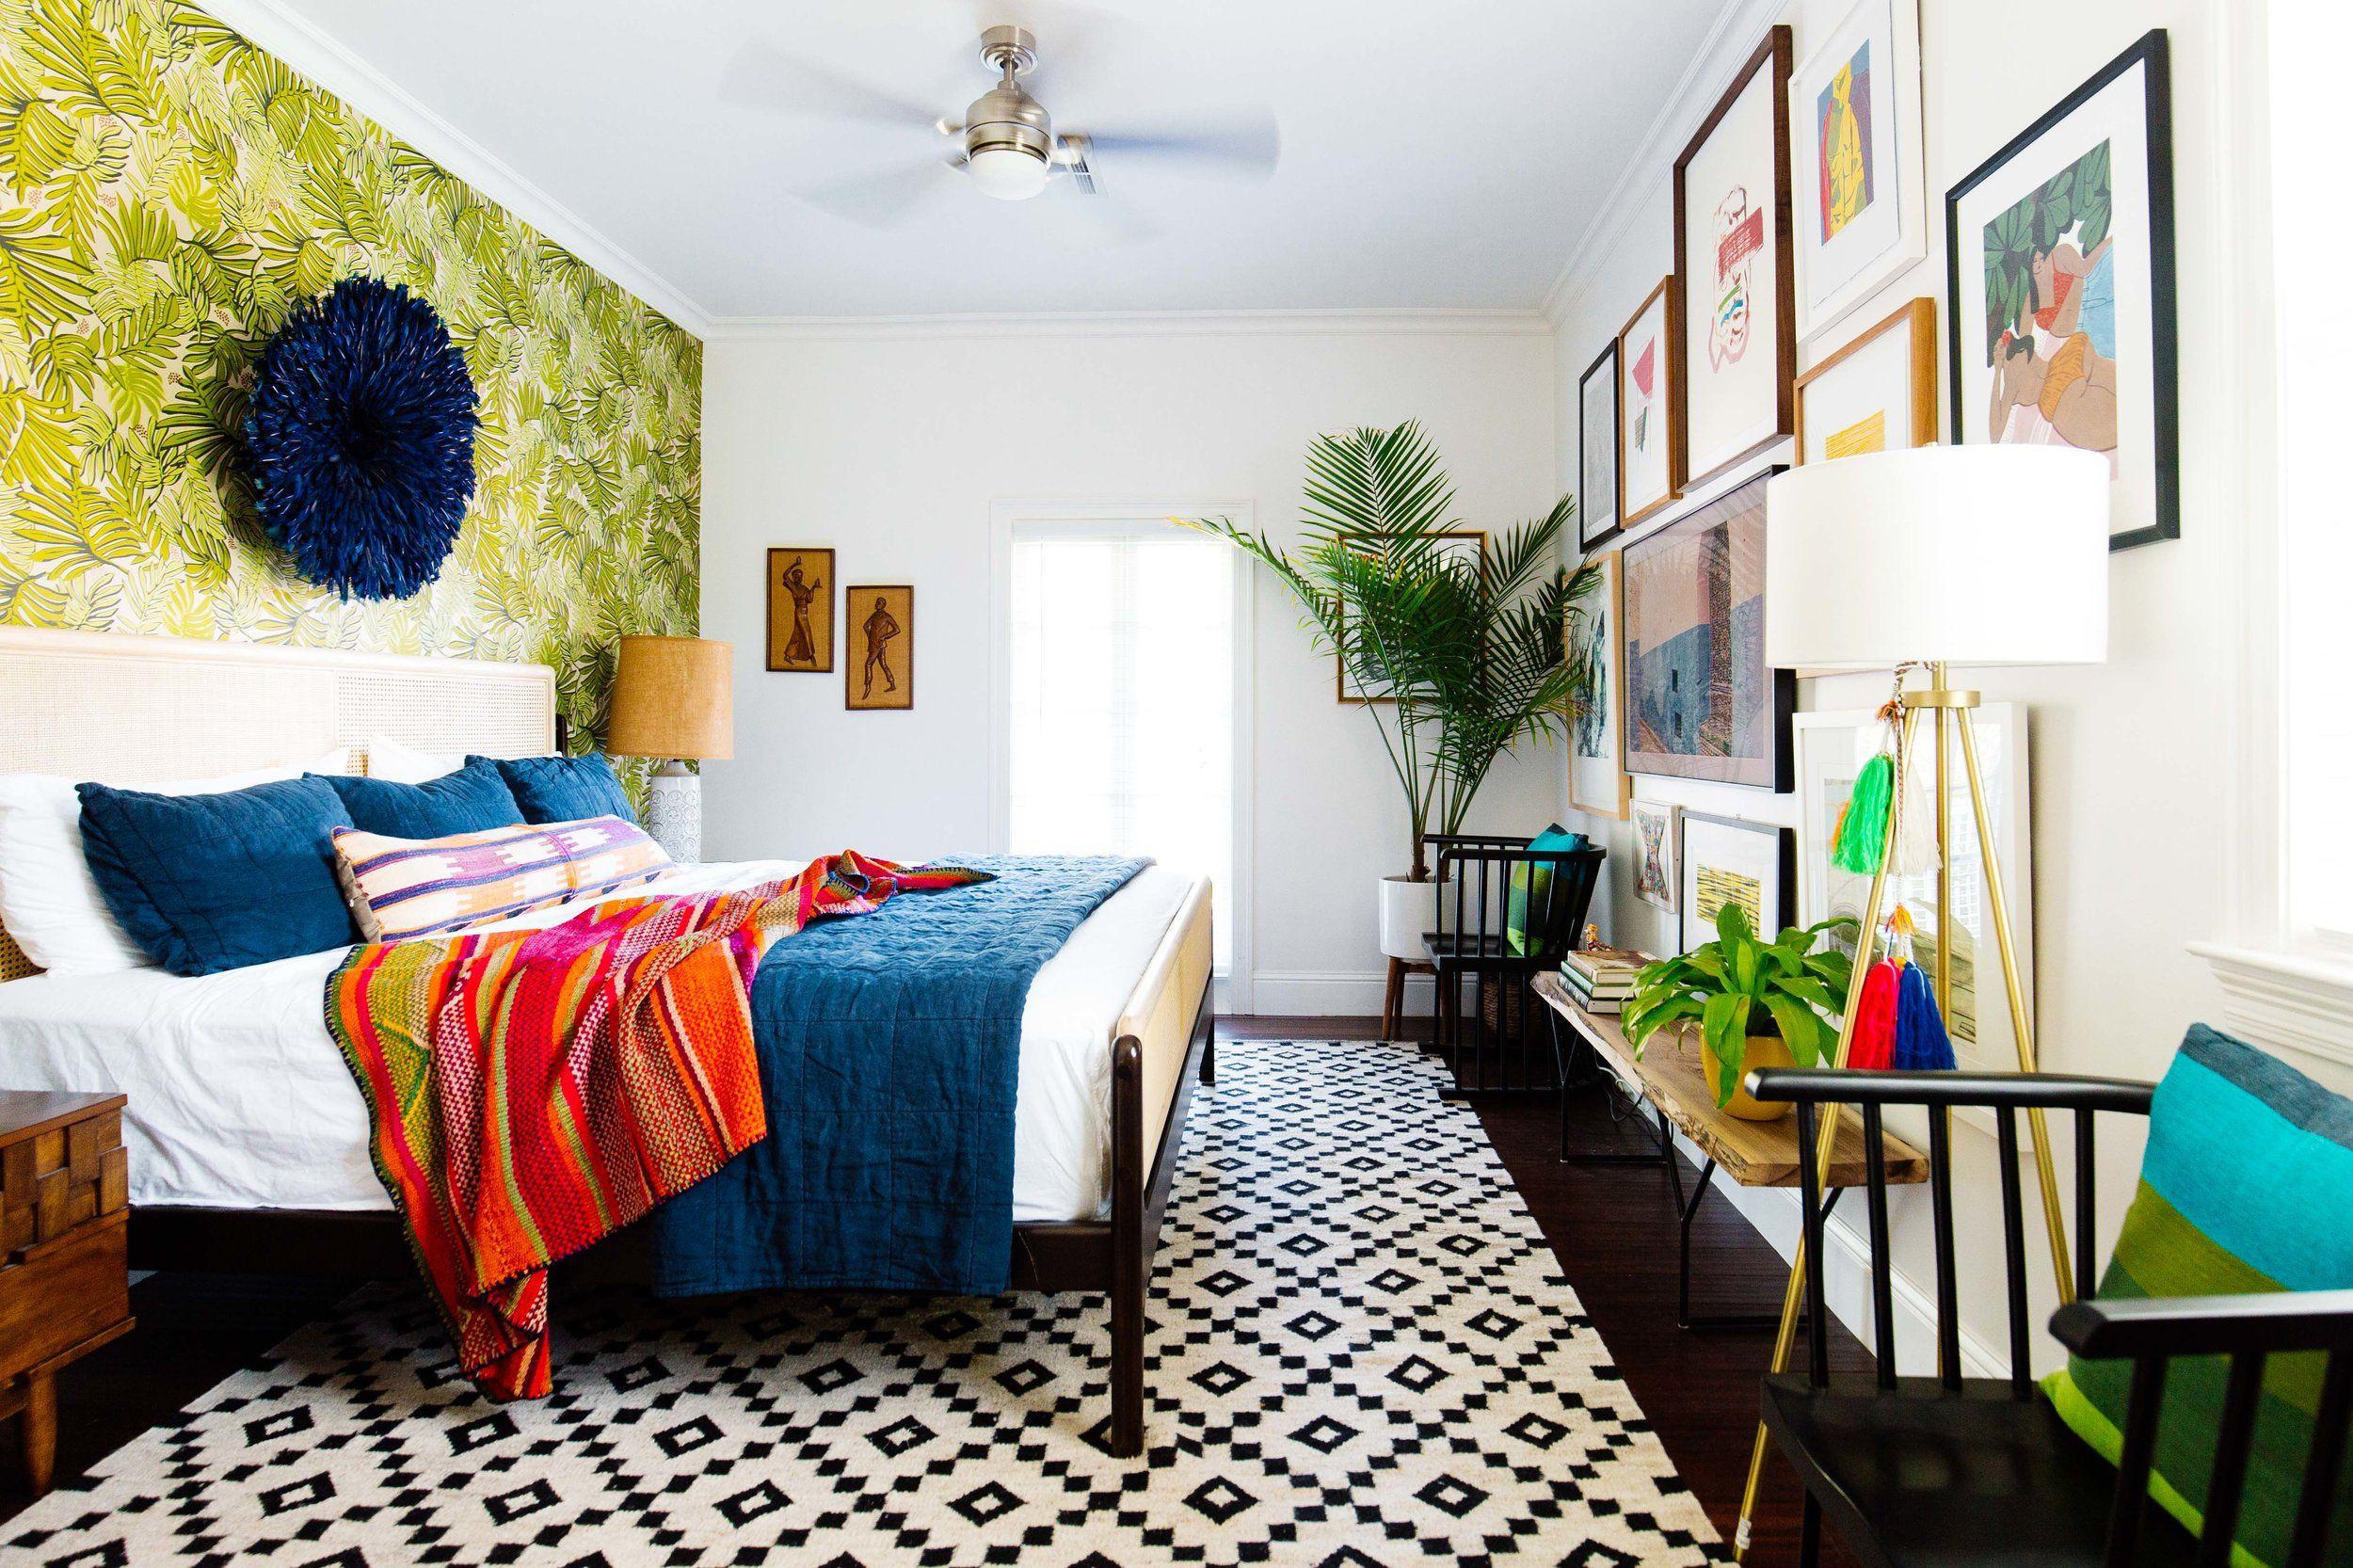 Our Crazy Colorful New Orleans Home Tour | Interiores y Hogar